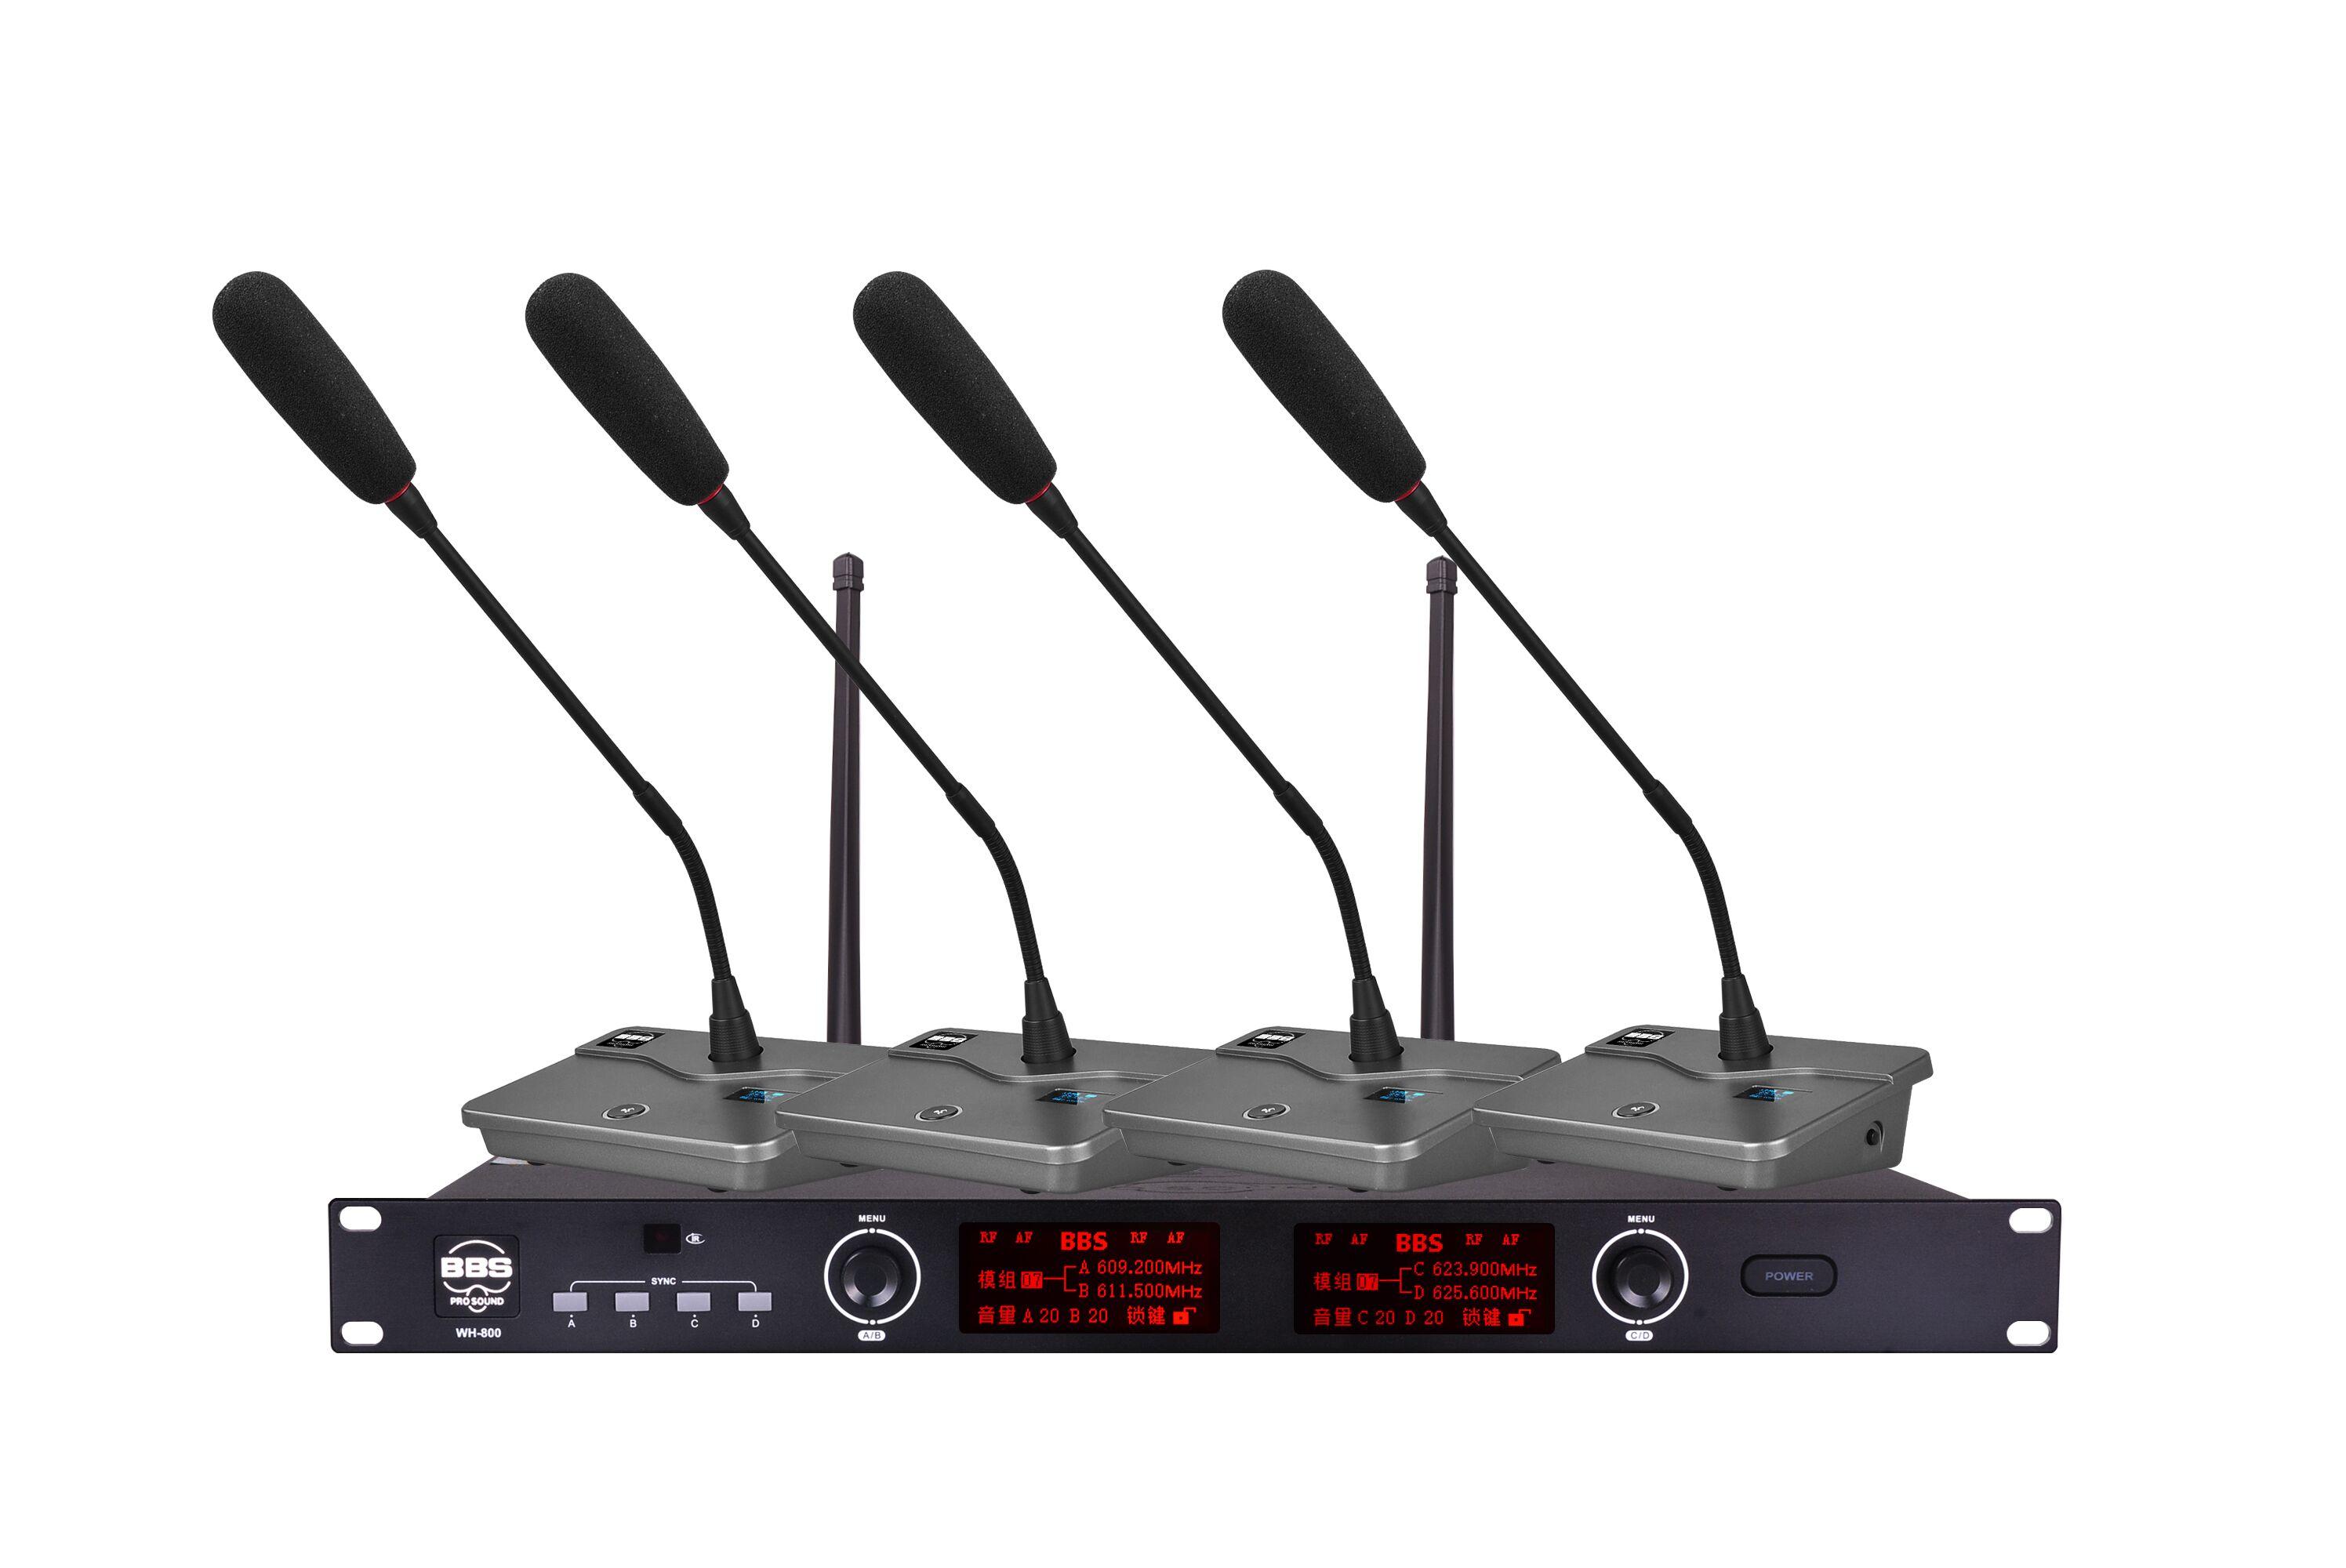 BBS WH800话筒